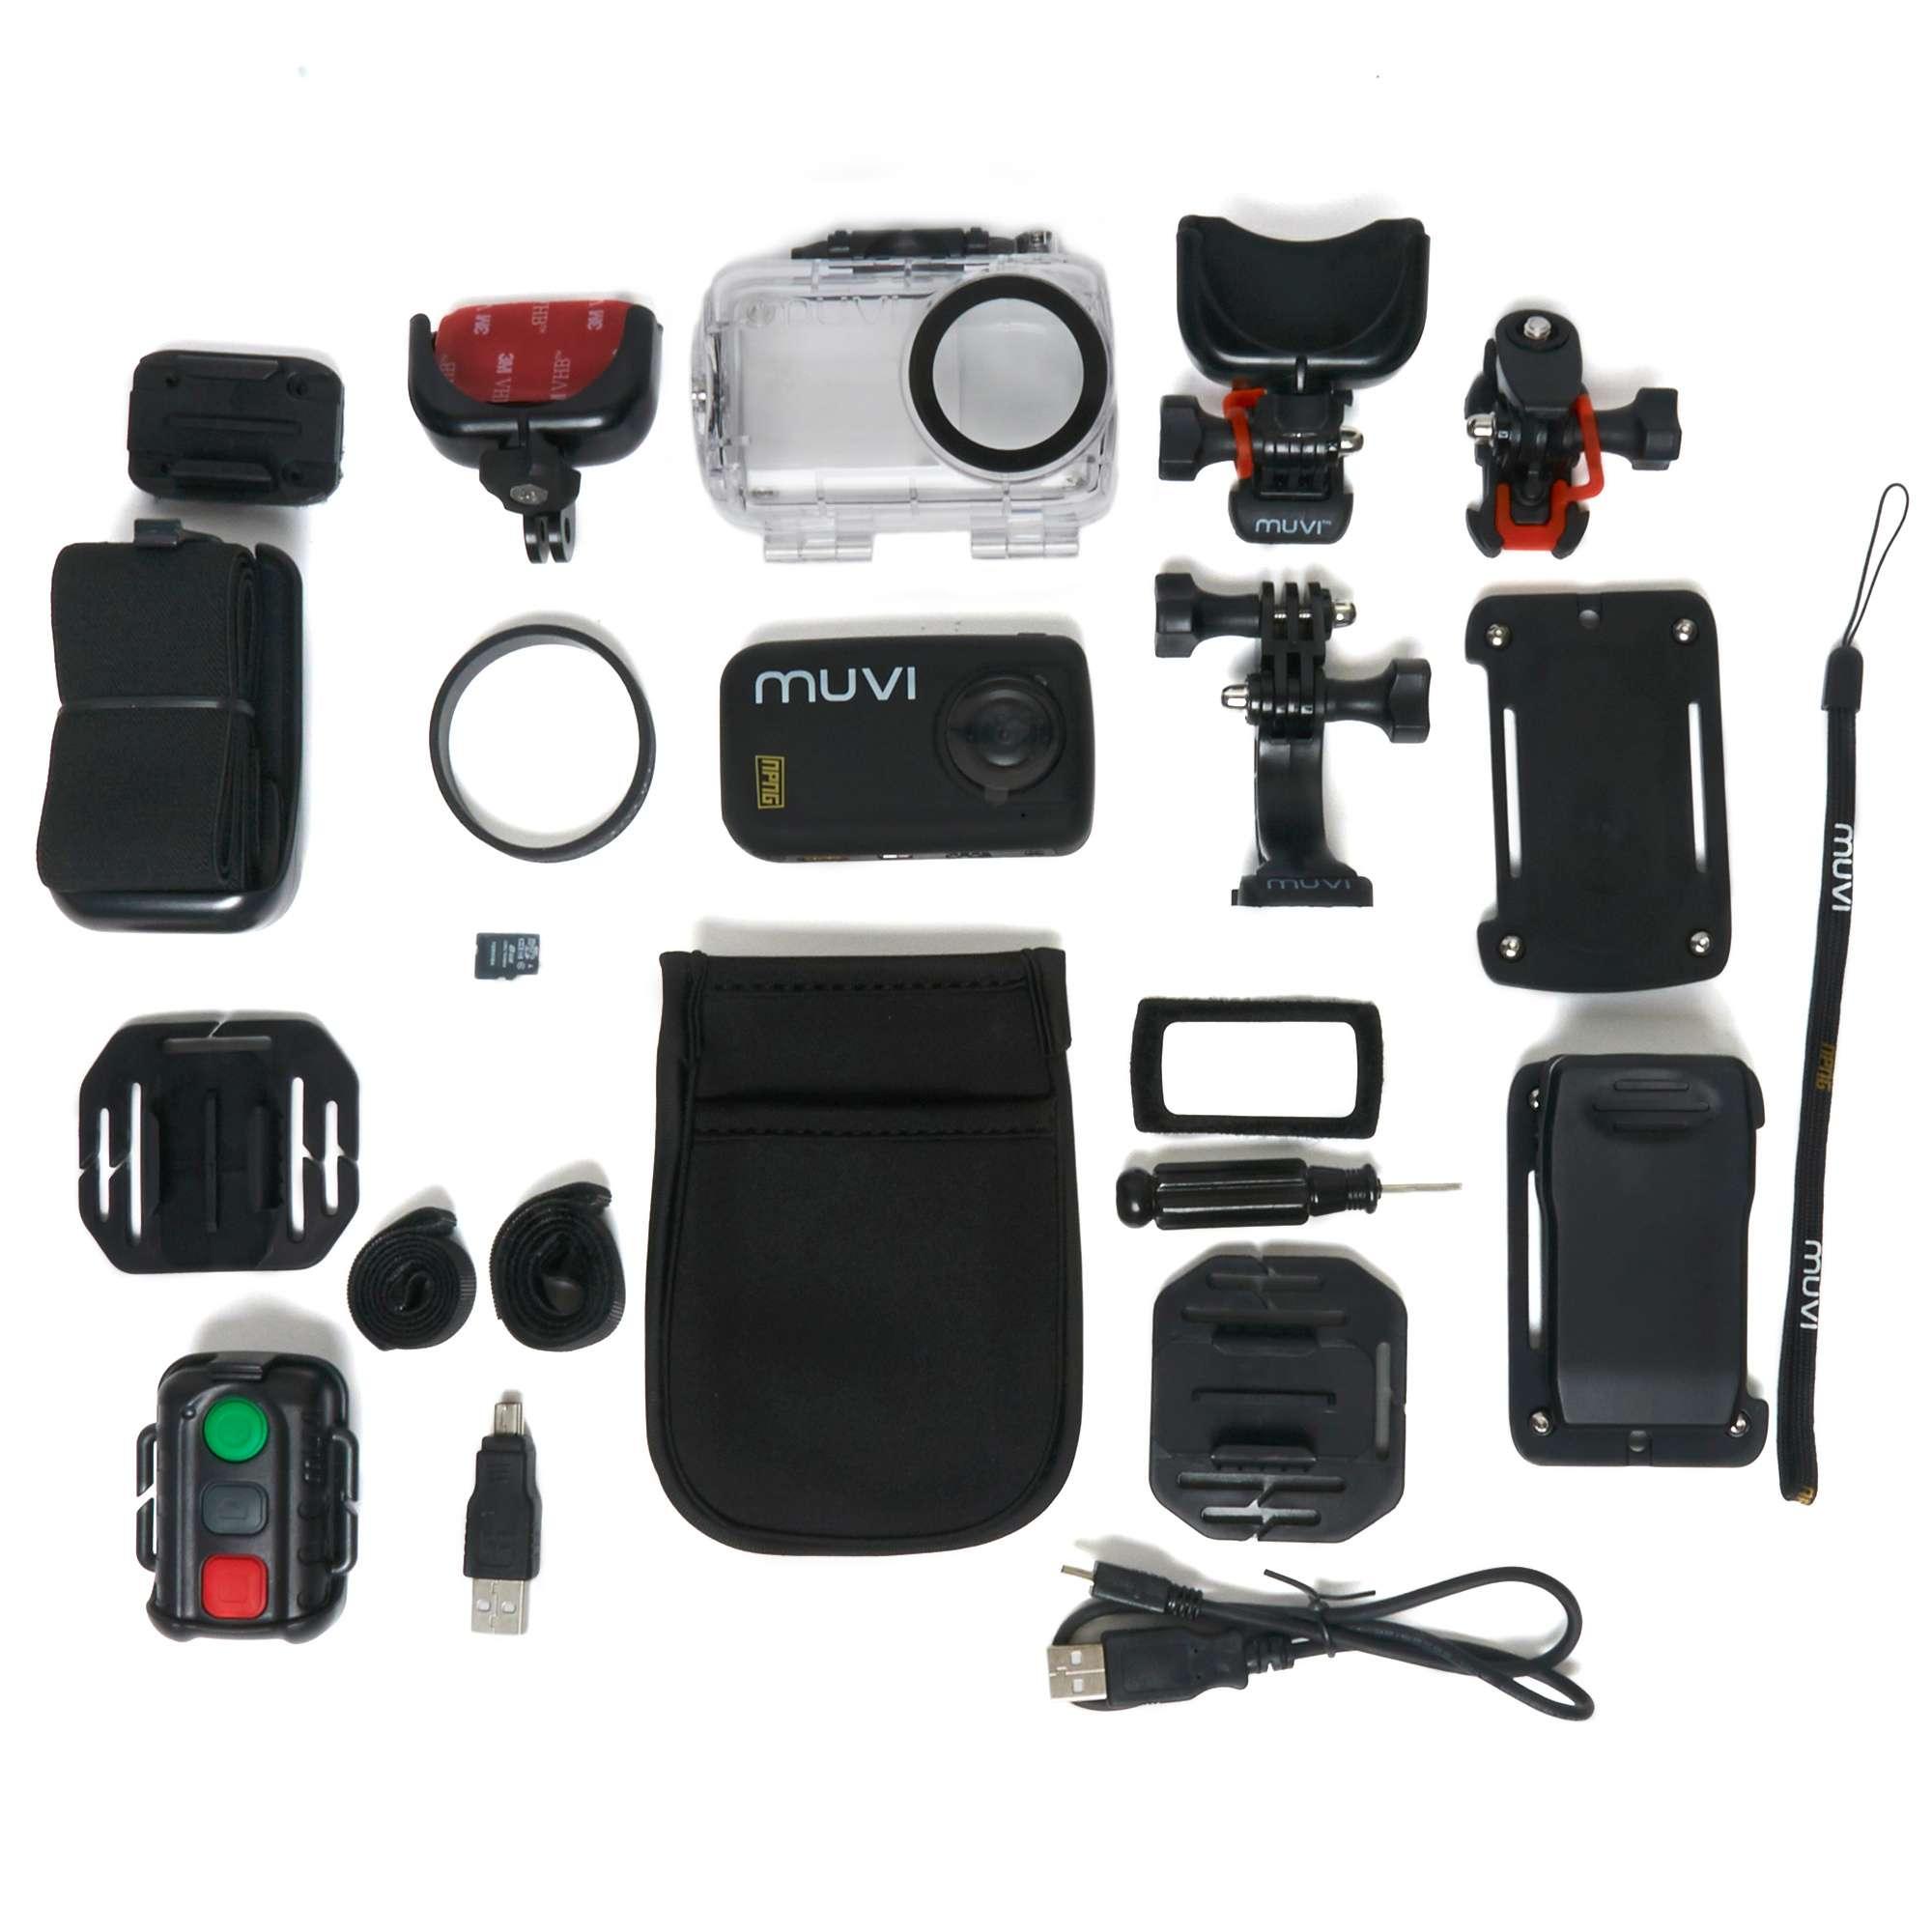 VEHO Muvi HD Mini Action Camcorder 8GB 'No Proof No Glory' Edition